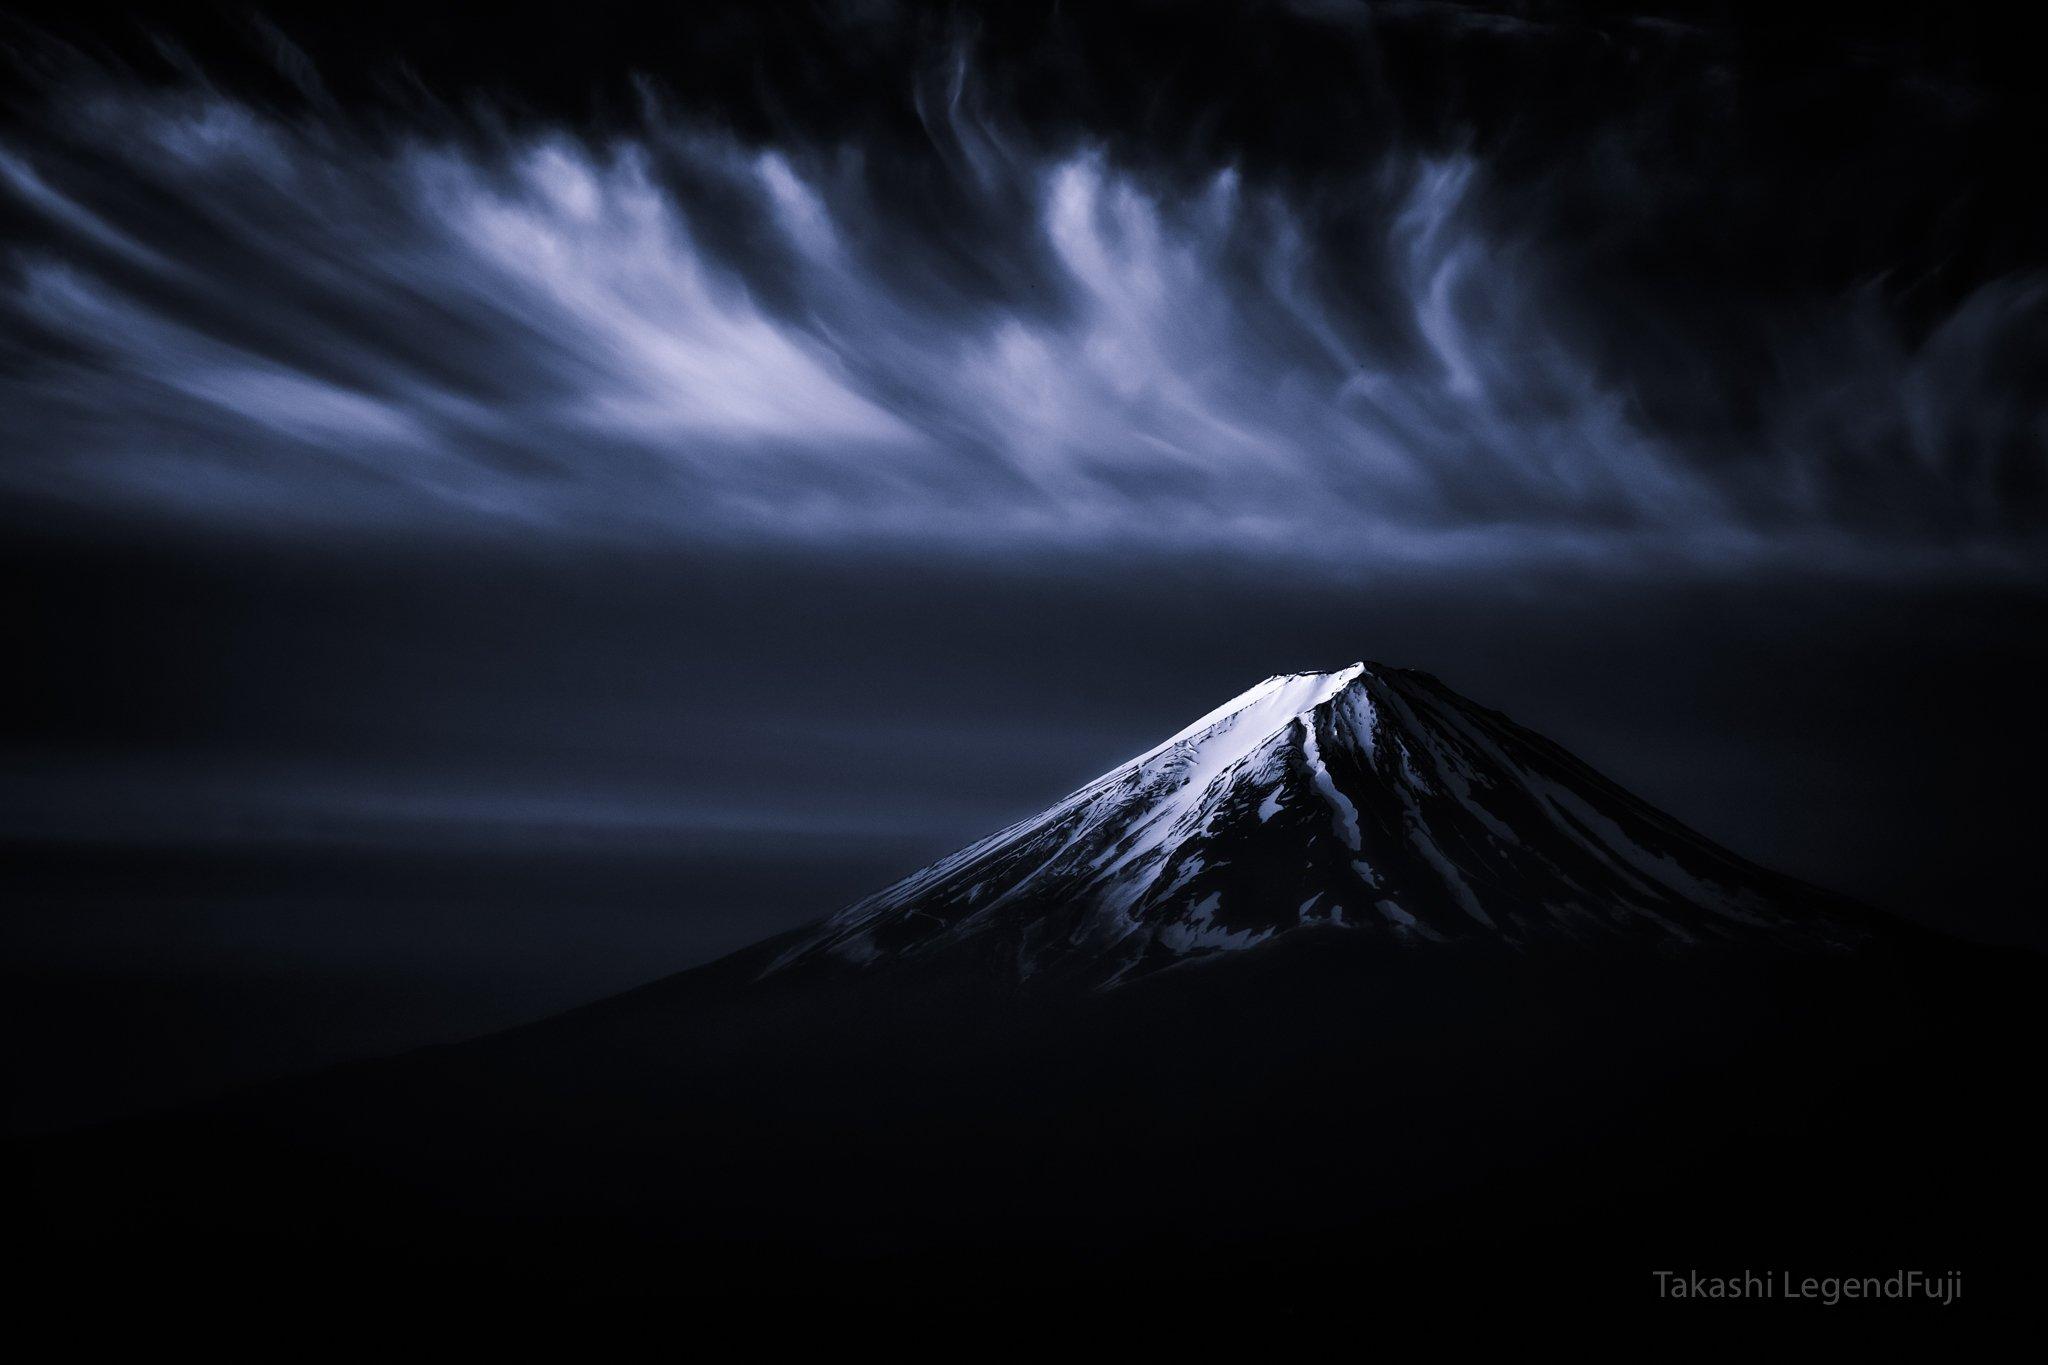 fuji,mountain,japan,snow,clouds,sky,amazing,beautiful,wonderful,peak,, Takashi